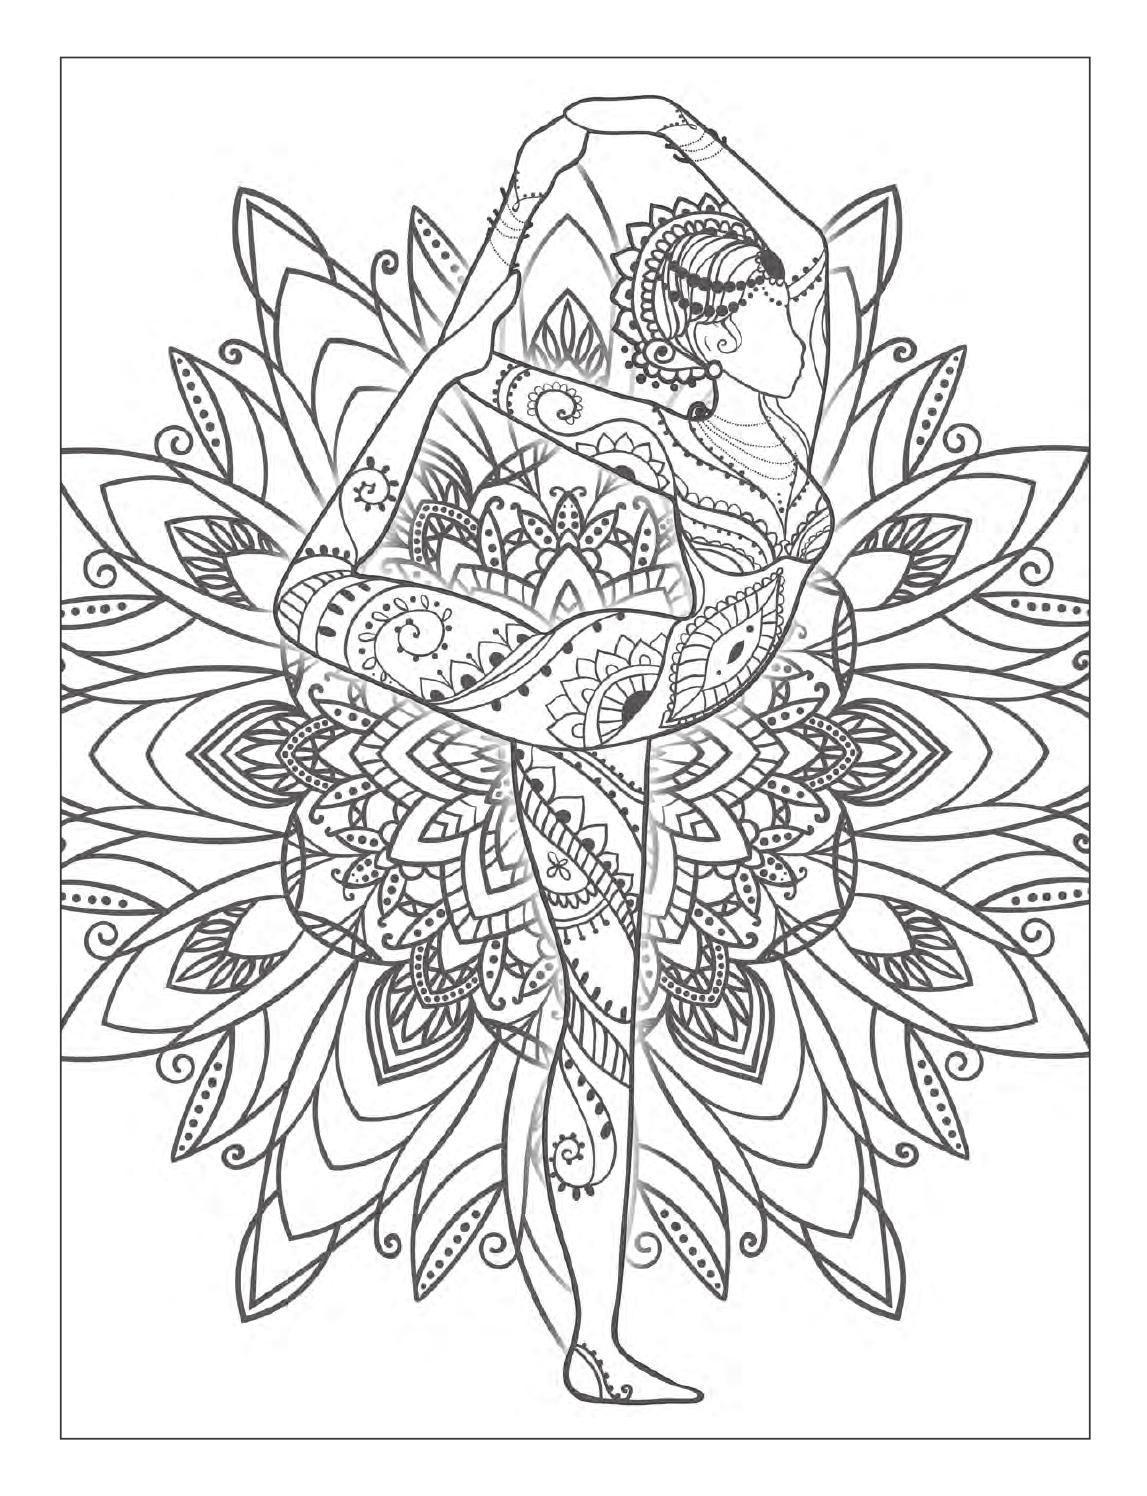 Meditation Coloring Mandalas Adults Poses Yoga Book With And Foryoga And Meditation Coloring B Mandala Coloring Pages Mandala Coloring Coloring Pages [ 1496 x 1147 Pixel ]